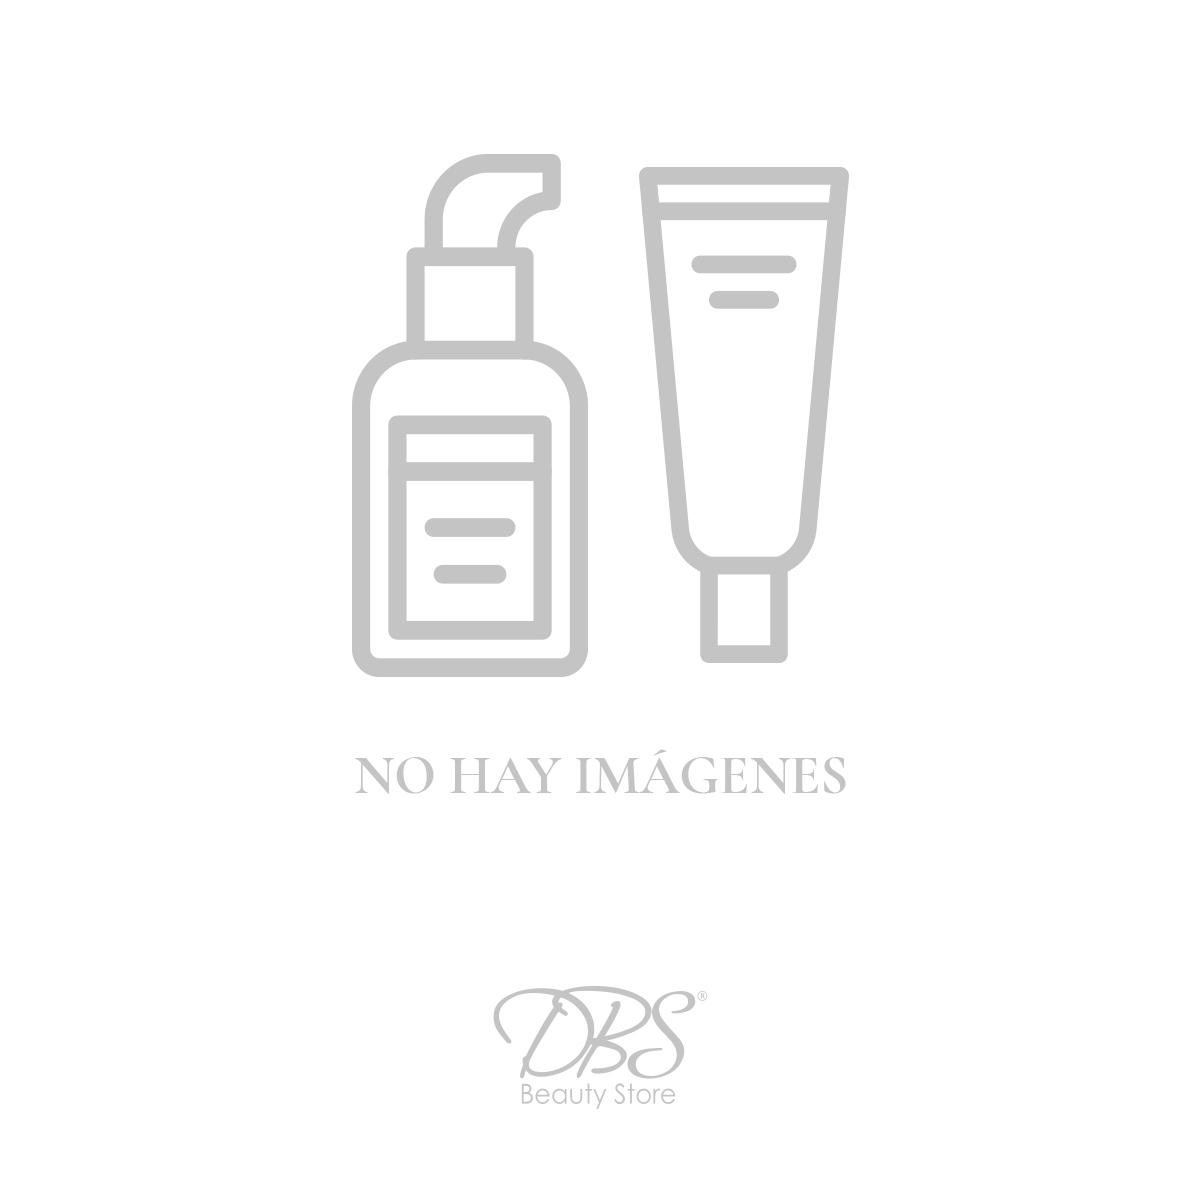 makeup-revolution-RT-31314.jpg